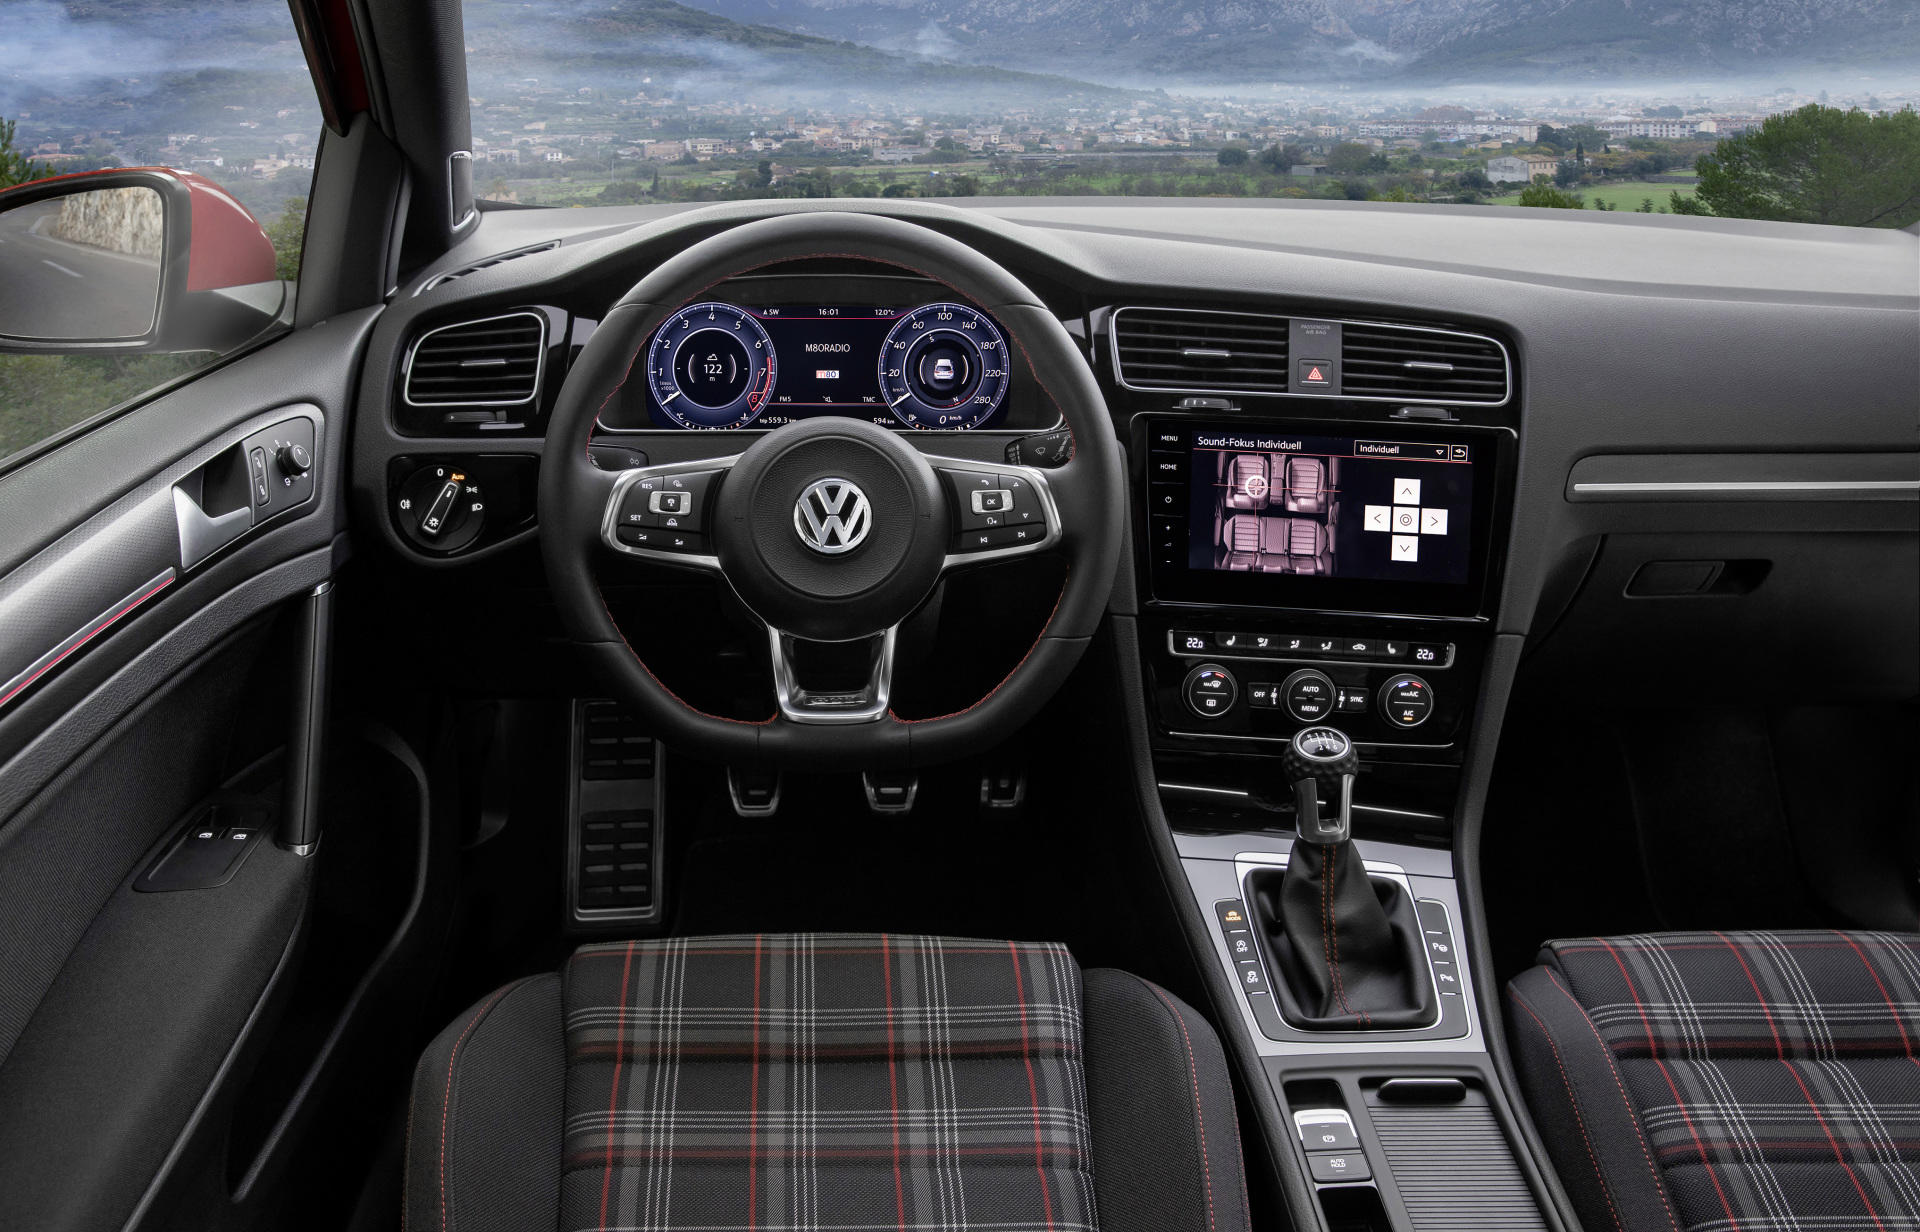 Golf 7 gti dsg interior